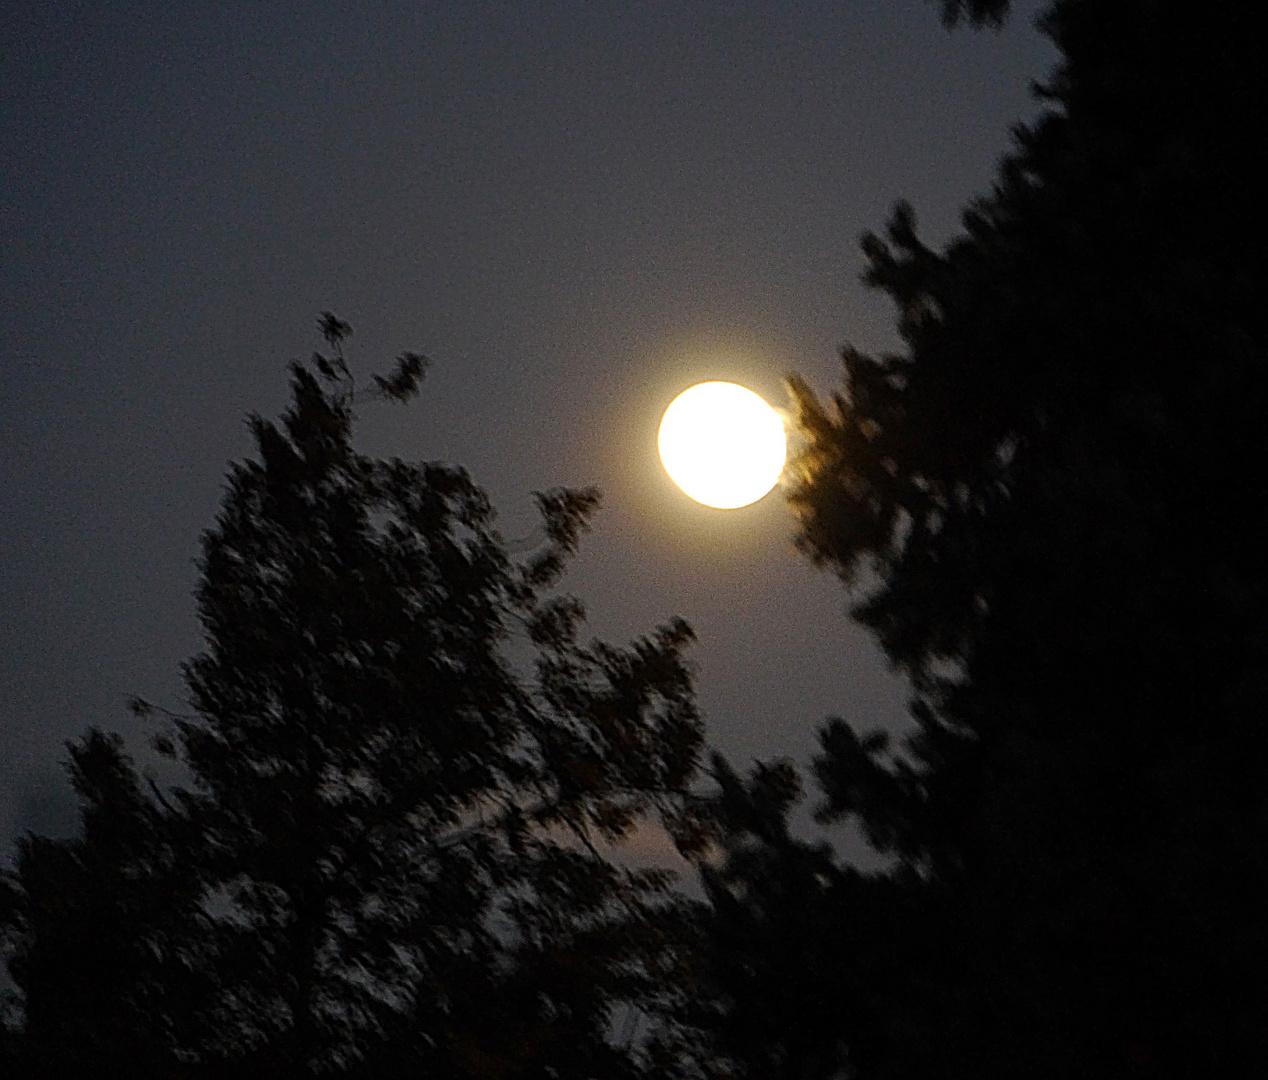 Bild 2: Mond über Ratingen